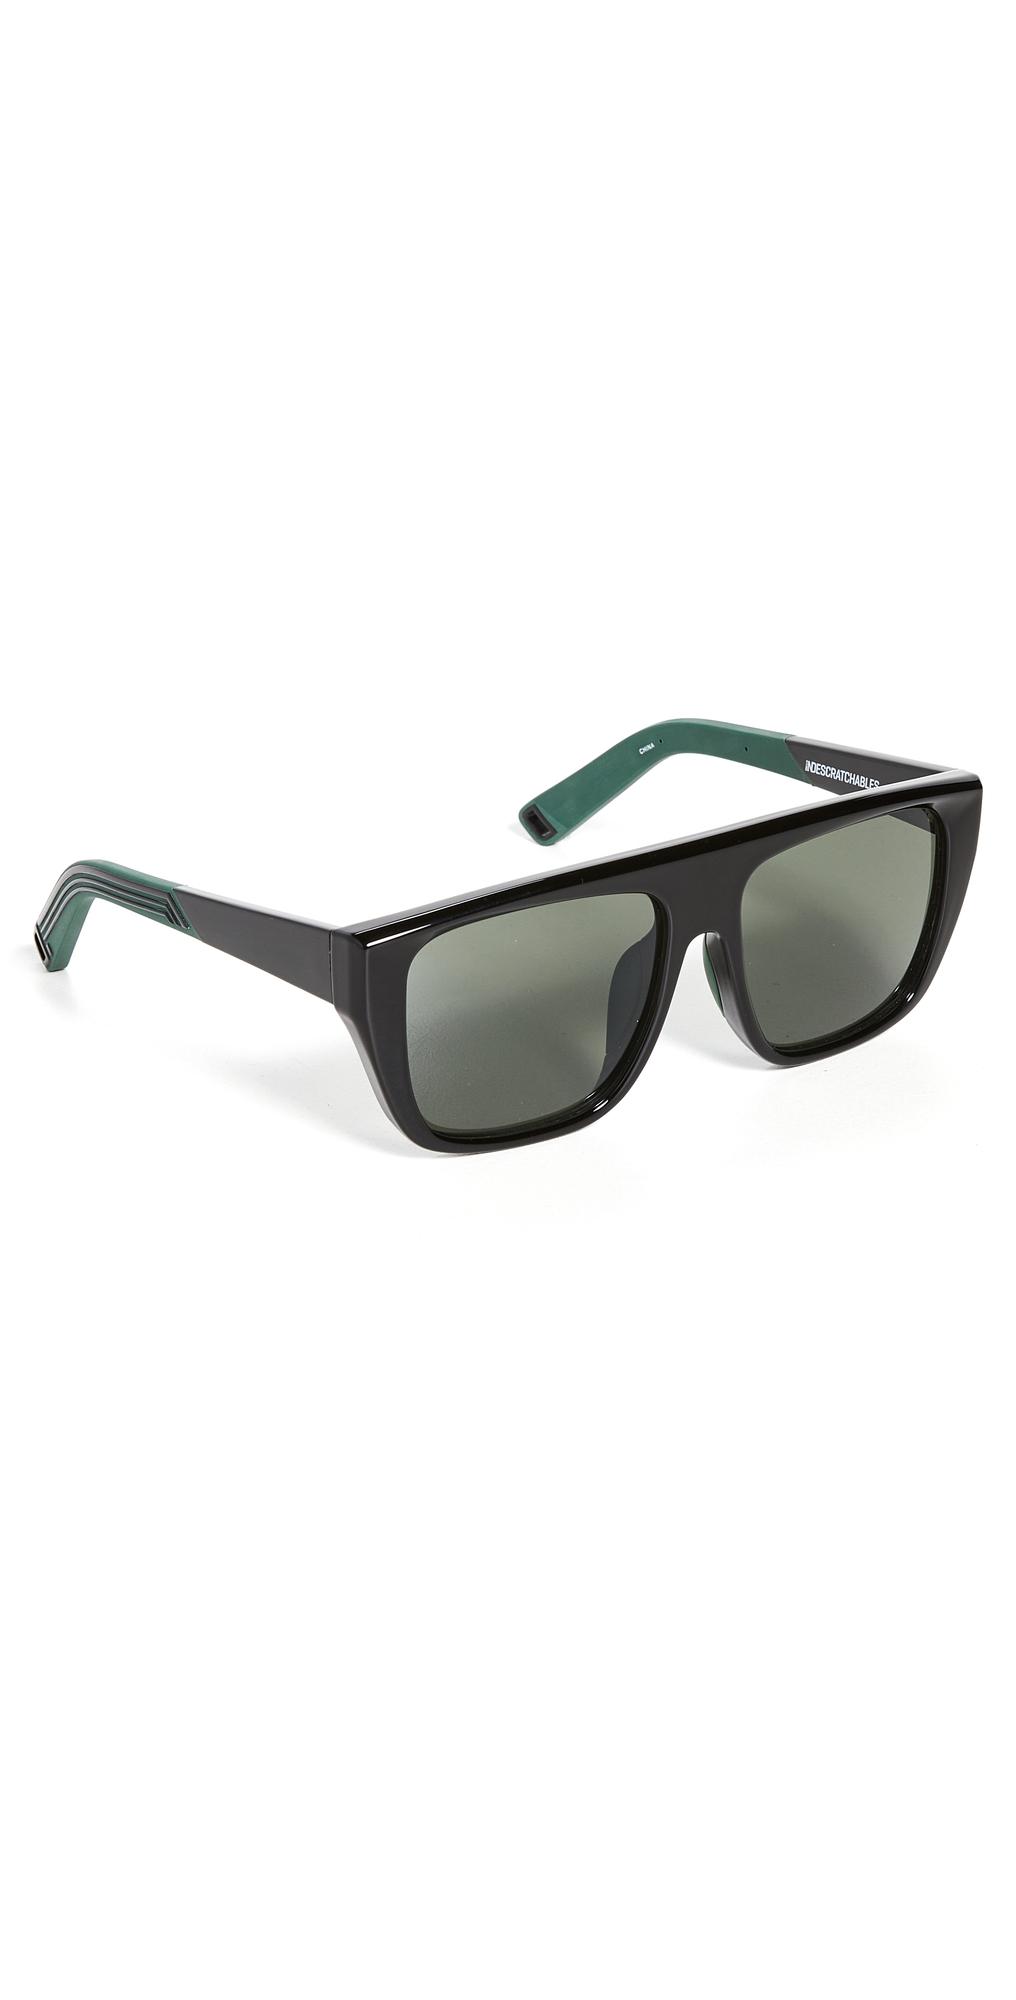 Grip 01 Sunglasses